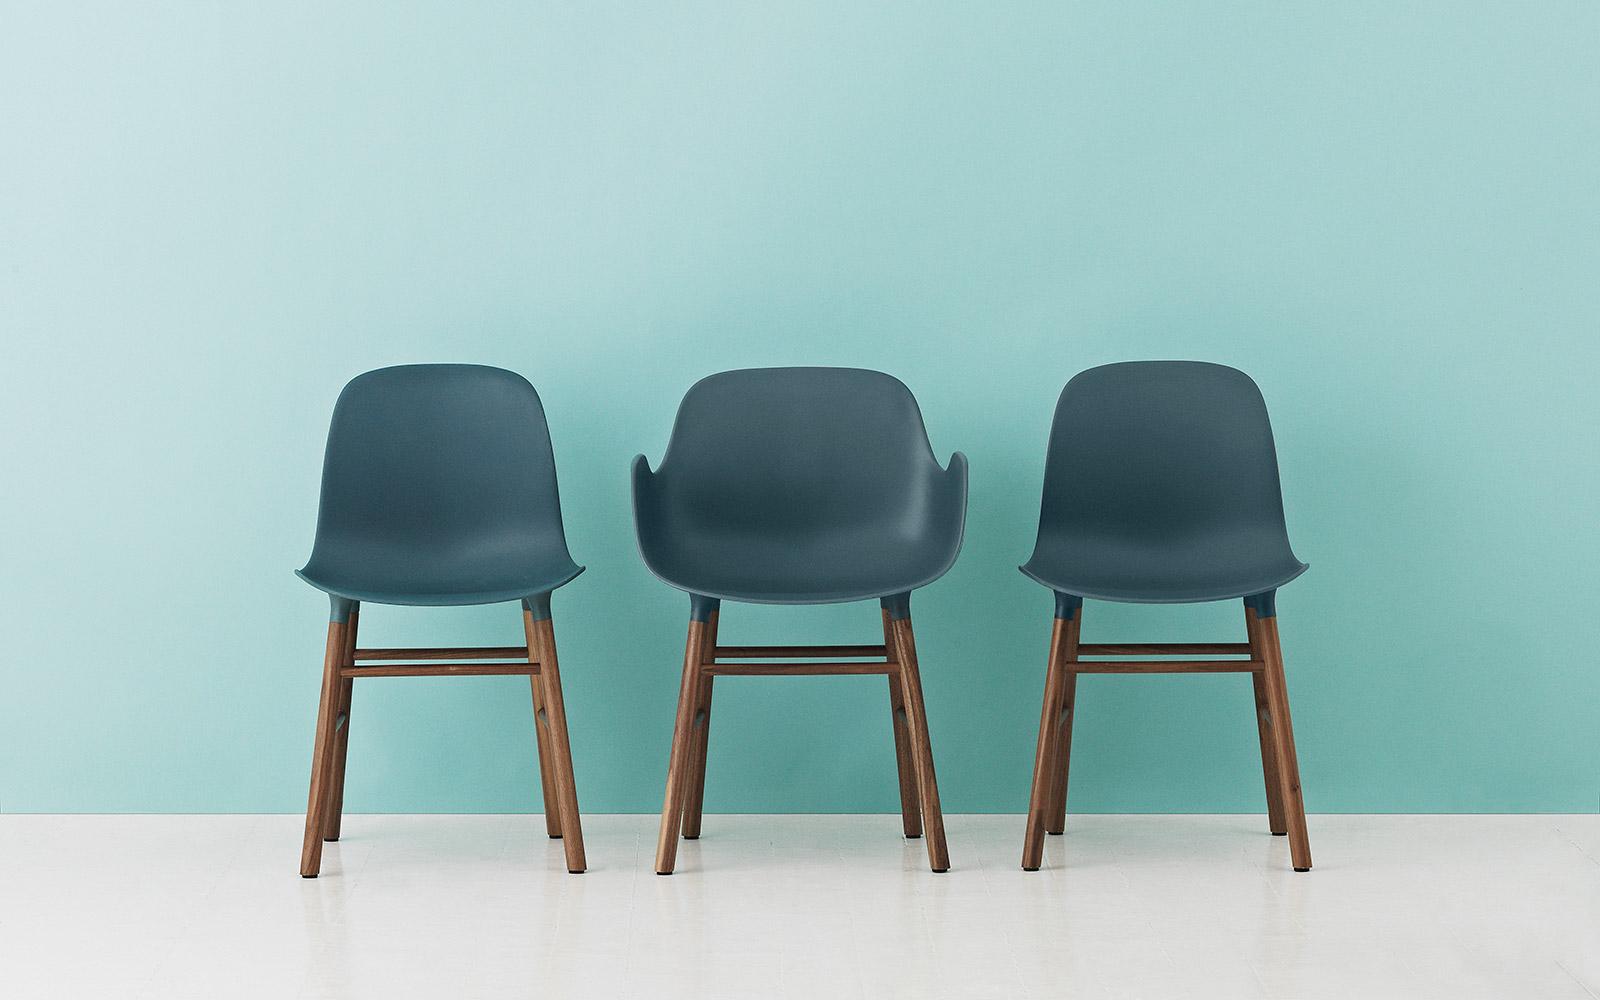 Form_Chair_Catalogue_8.ashx